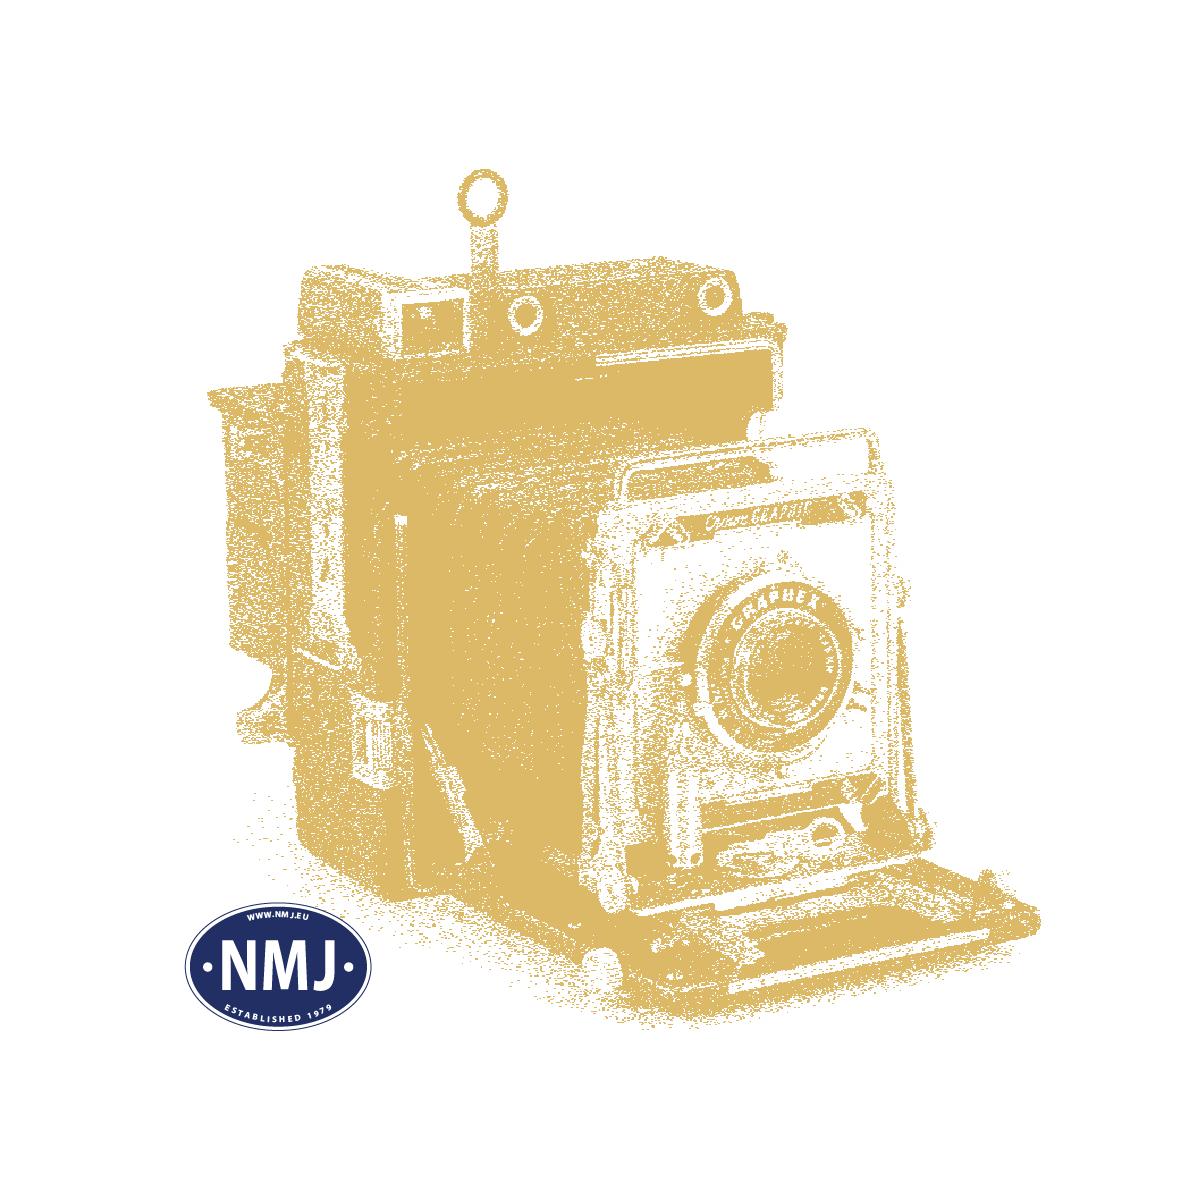 NMJT80.103AC - NMJ Topline NSB EL17.2223, AC